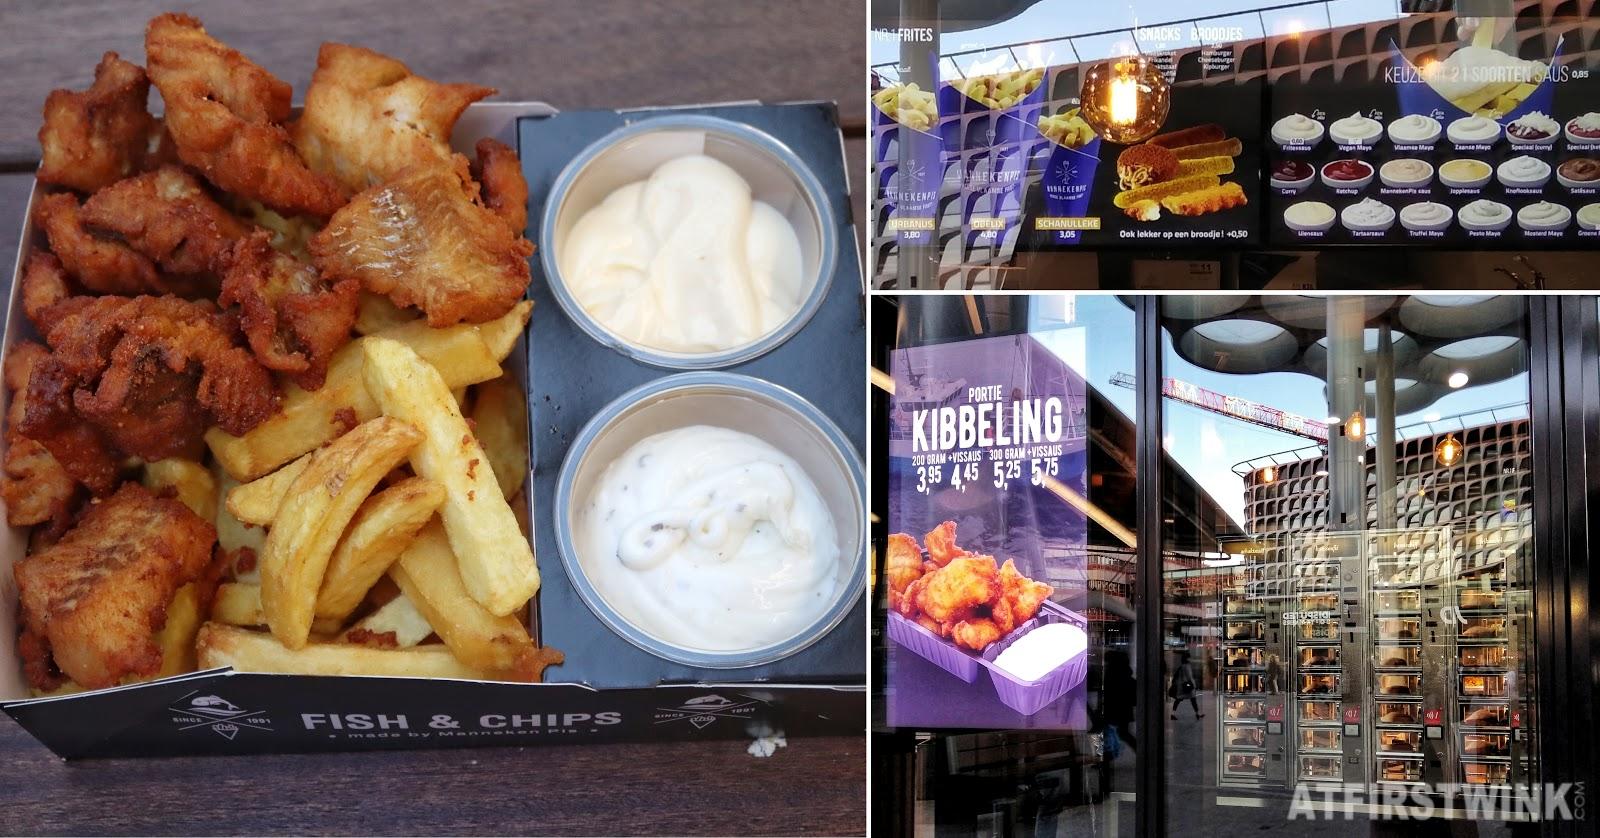 Manneken Pis Friet fries shop Utrecht Centraal Station fish and chips Kibbeling vlaamse friet ravigotte sauce mayonnaise fries fried fish bites